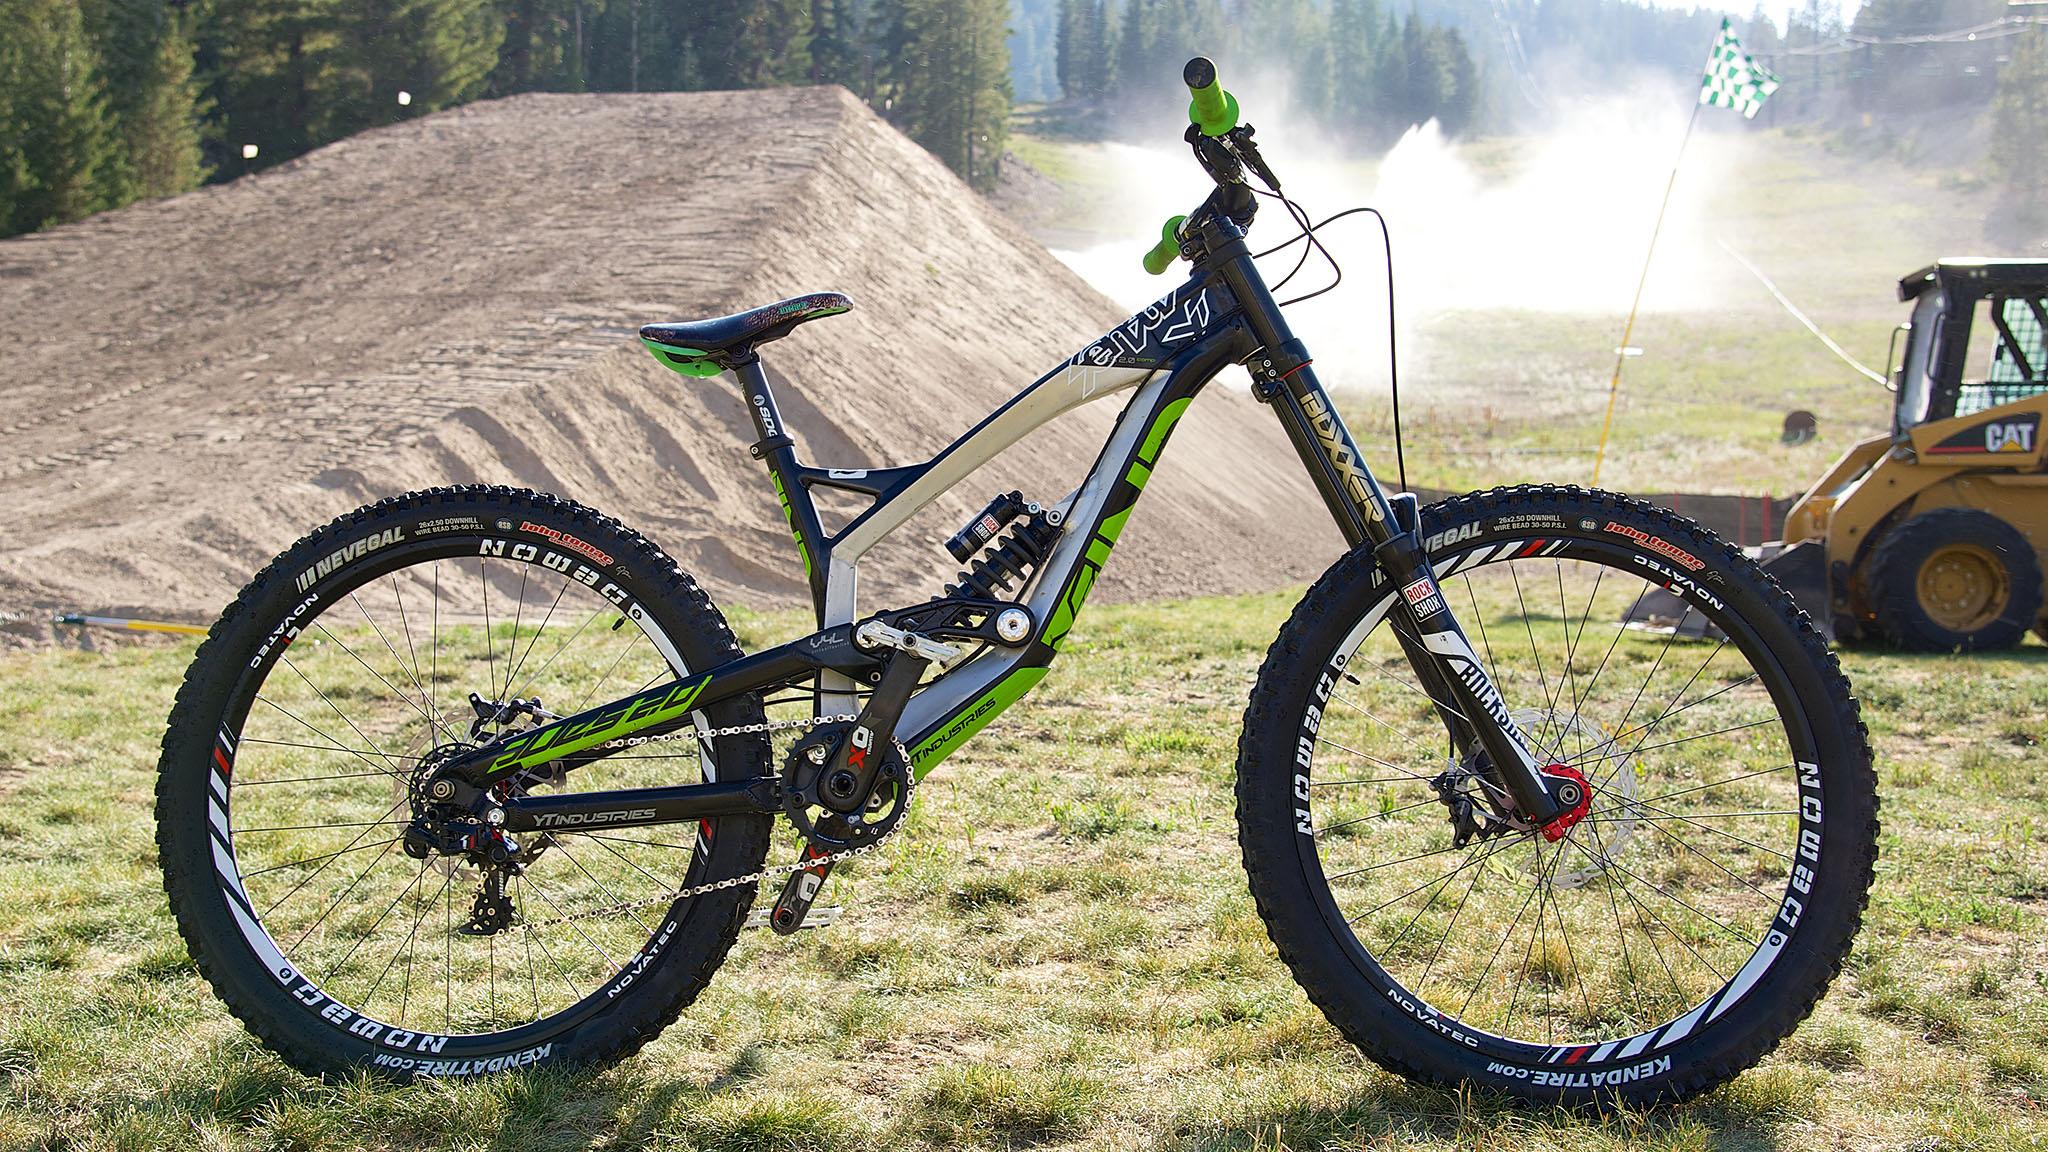 Cam Zink's Mammoth bike build